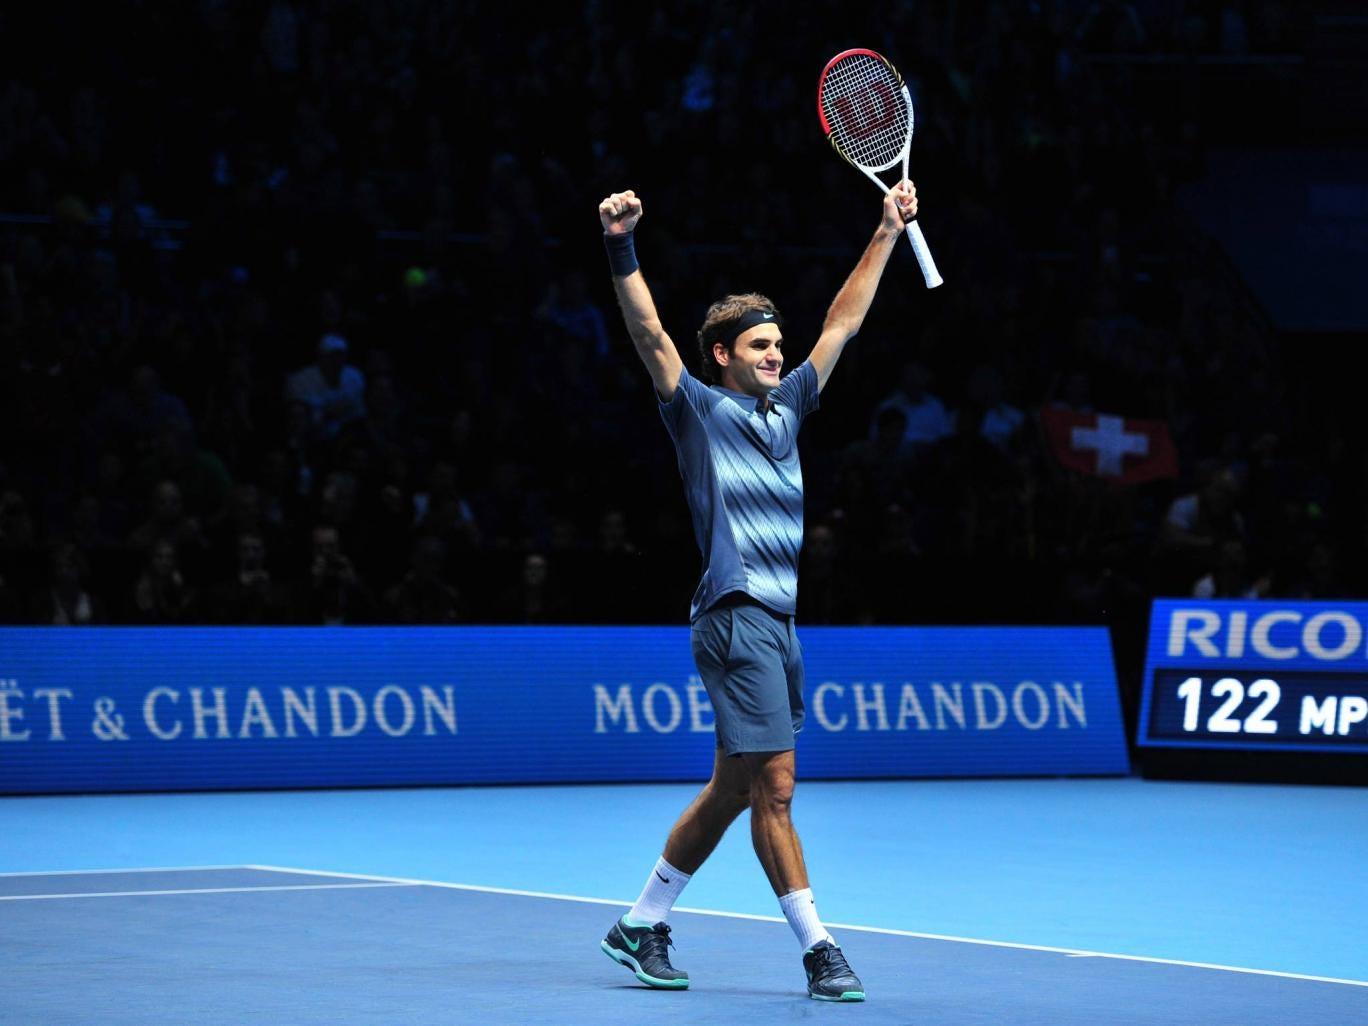 Roger Federer celebrates victory over Del Potro